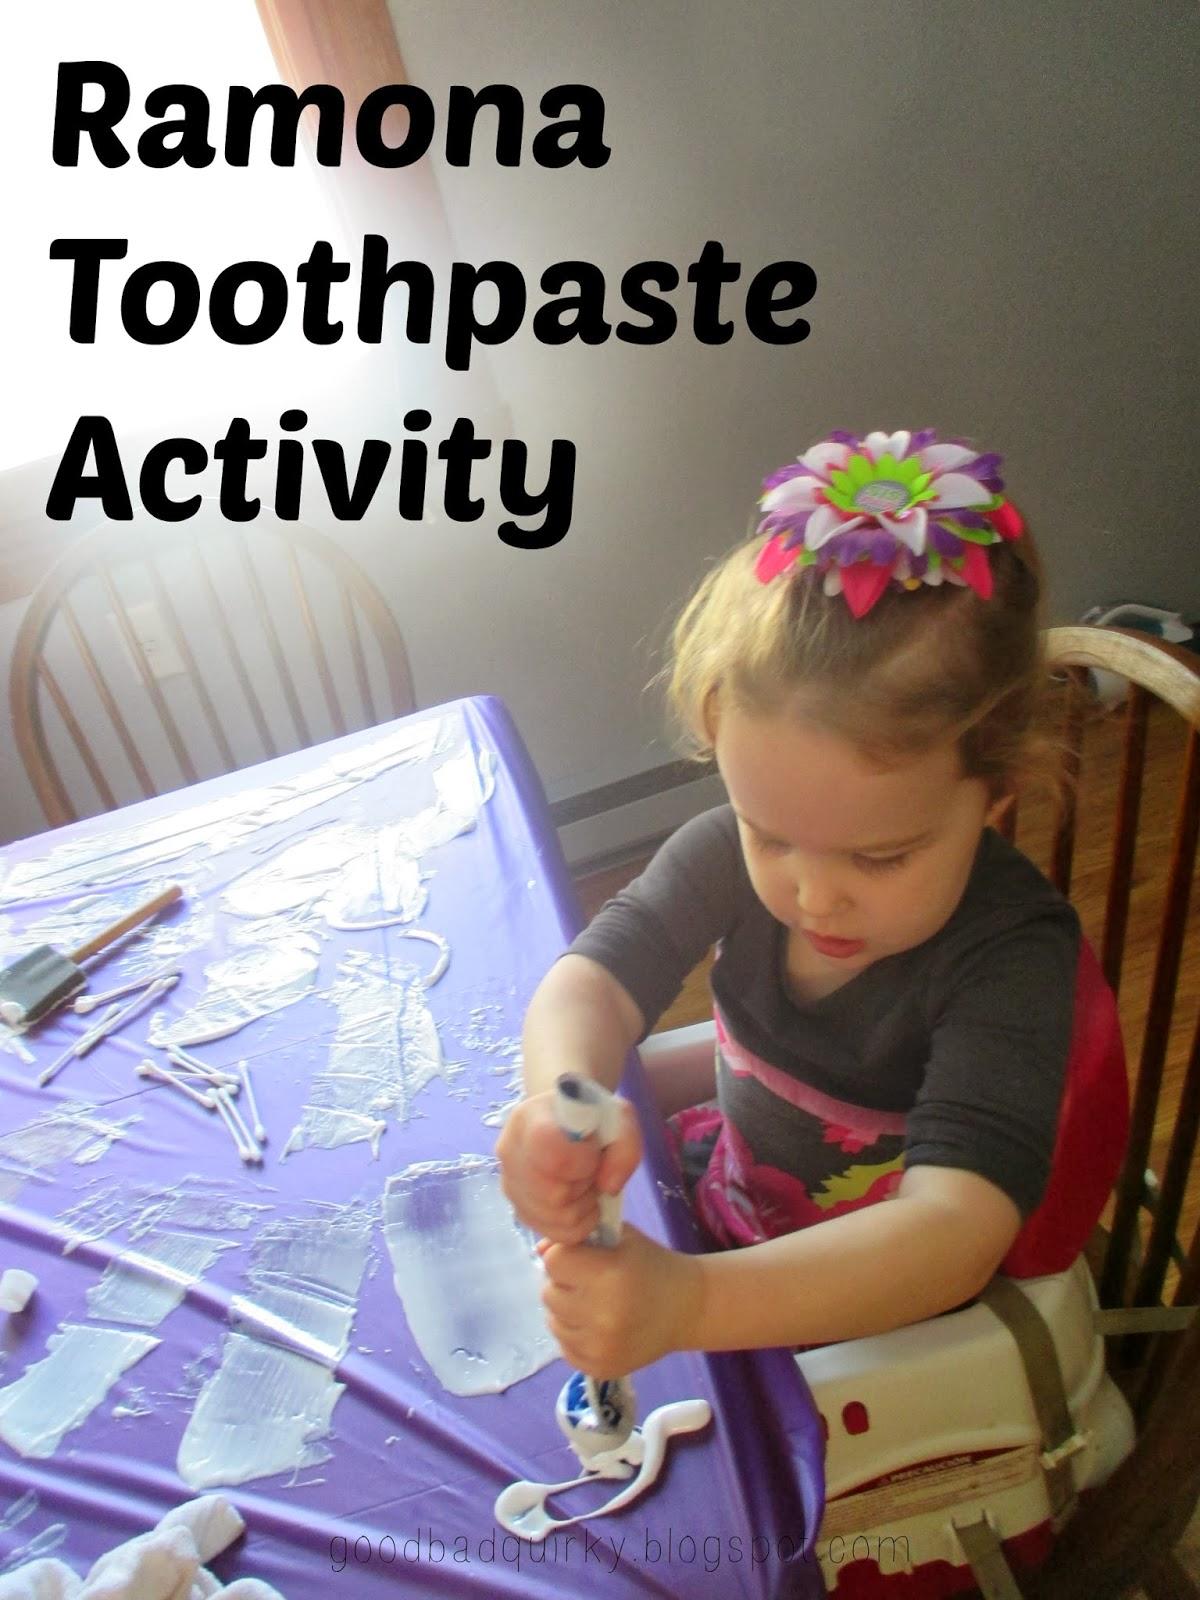 Ramona Toothpaste Activity